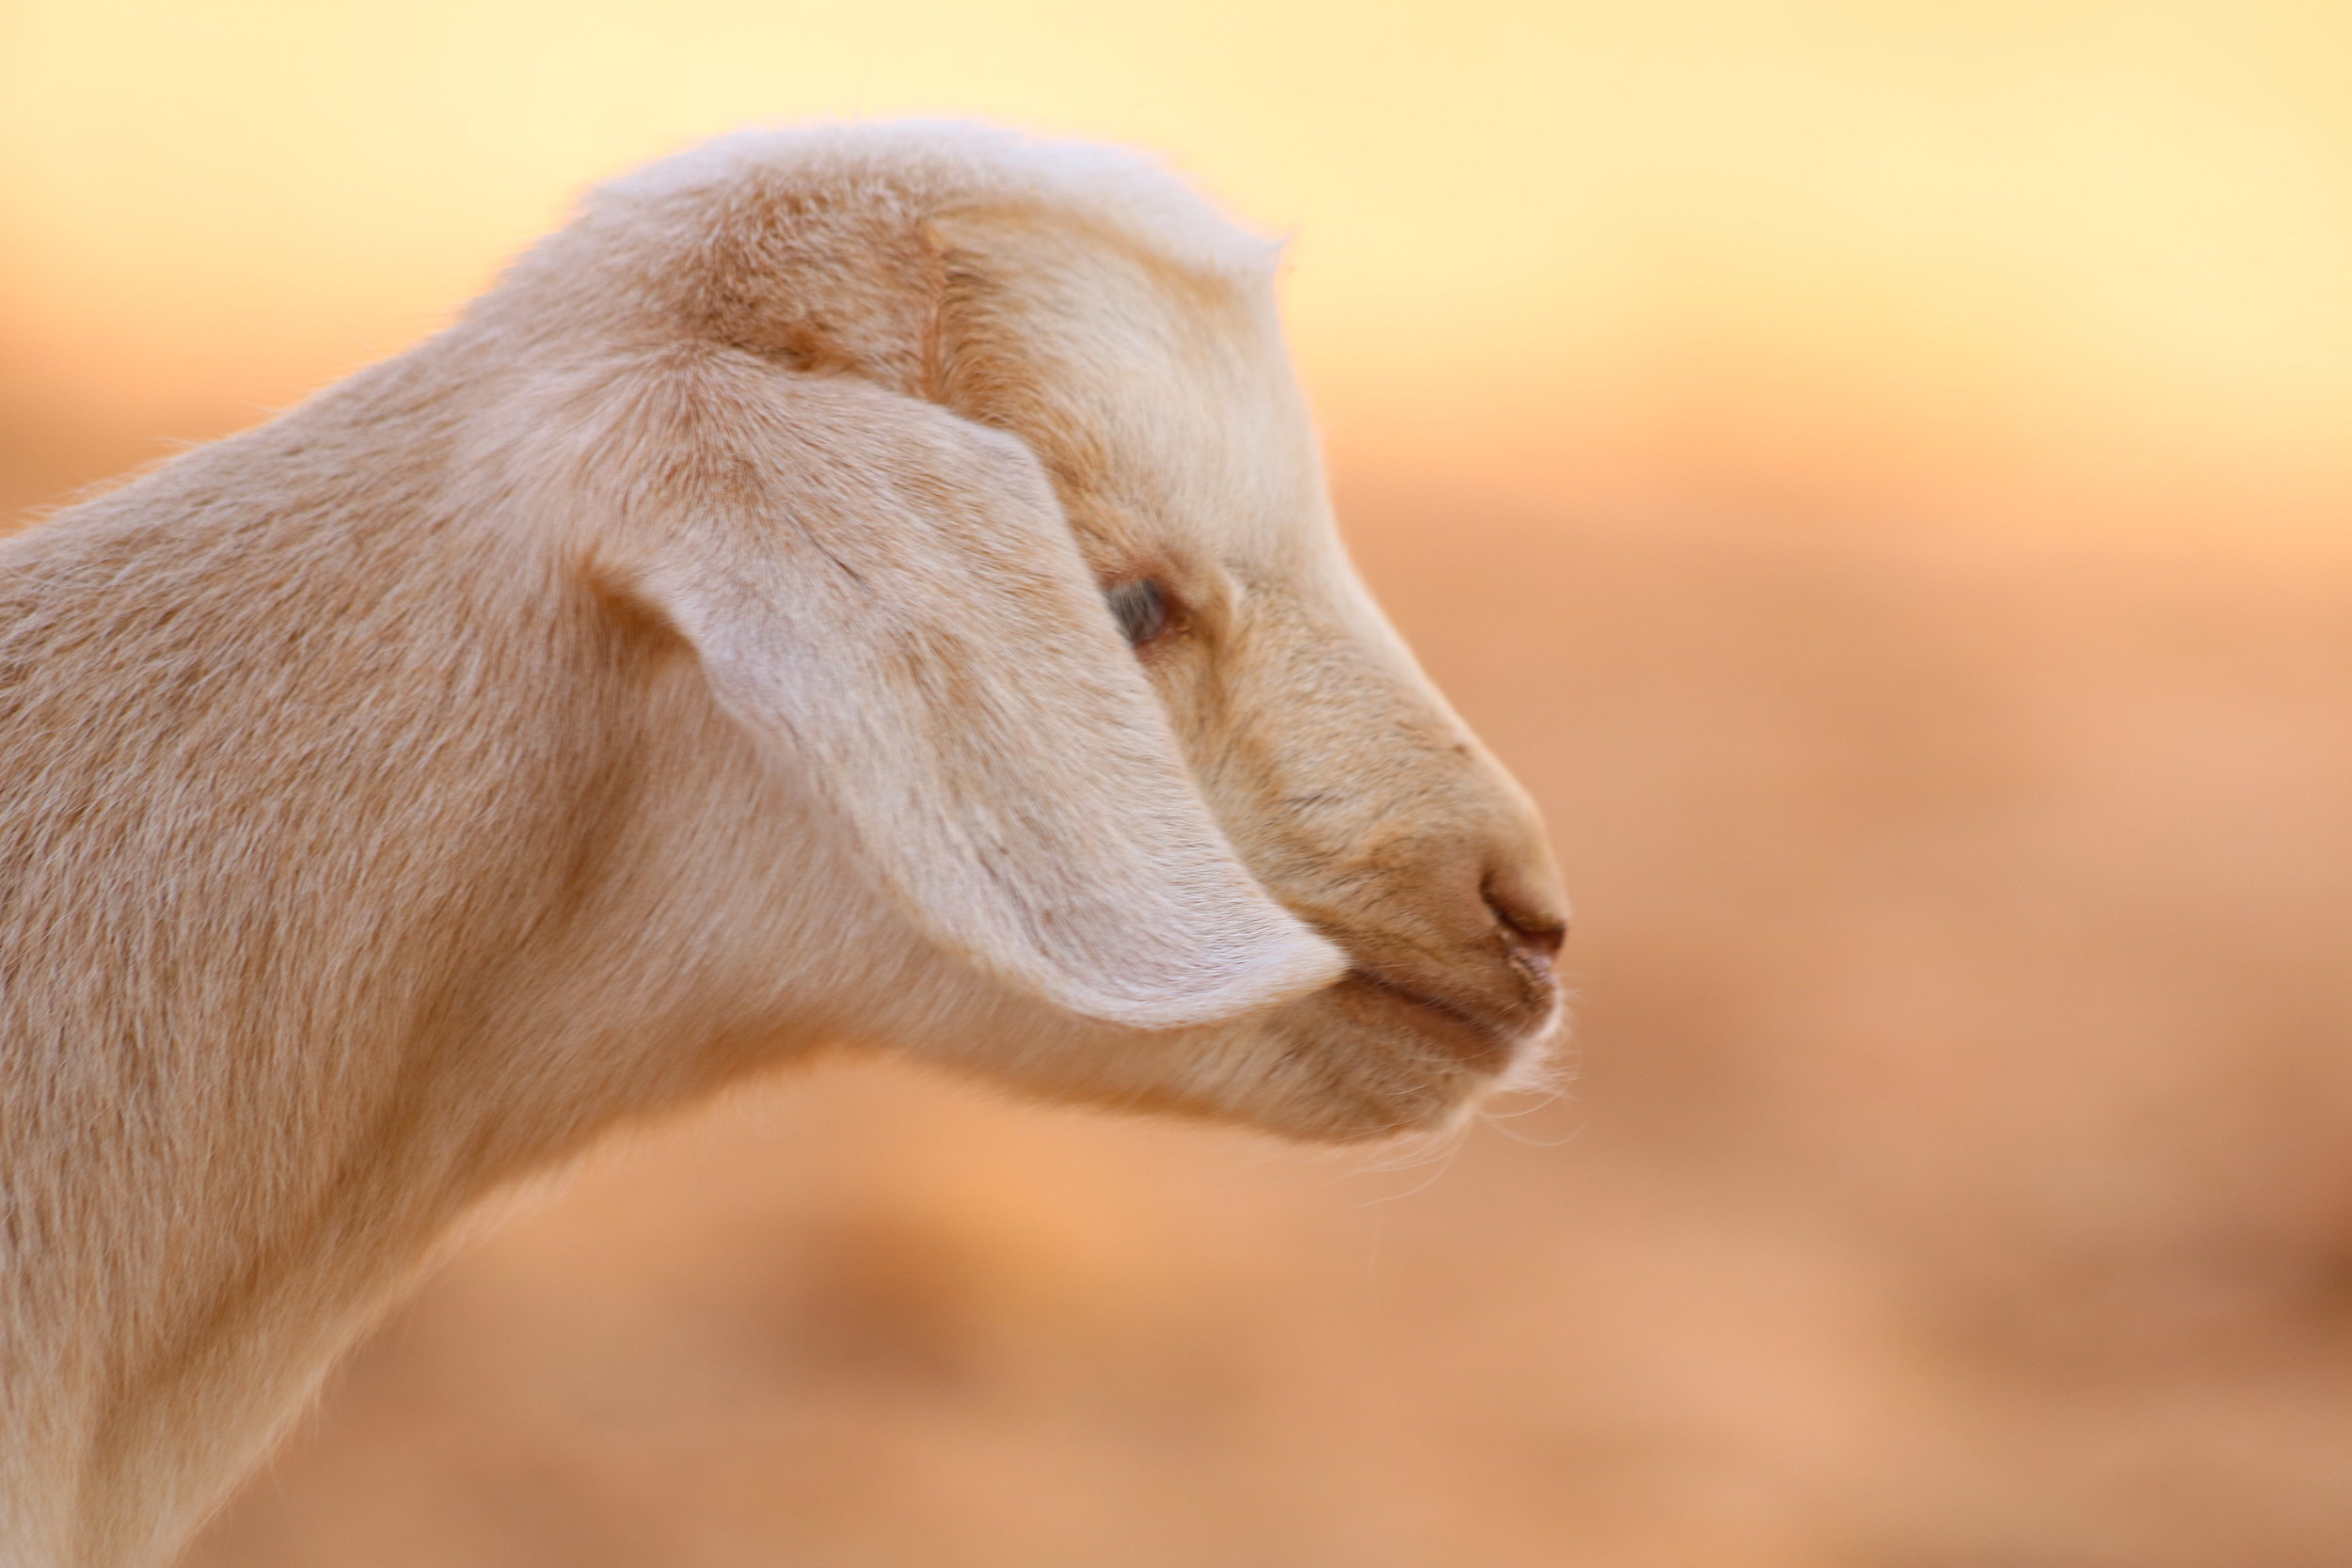 morroco-baby-goat-2.JPG